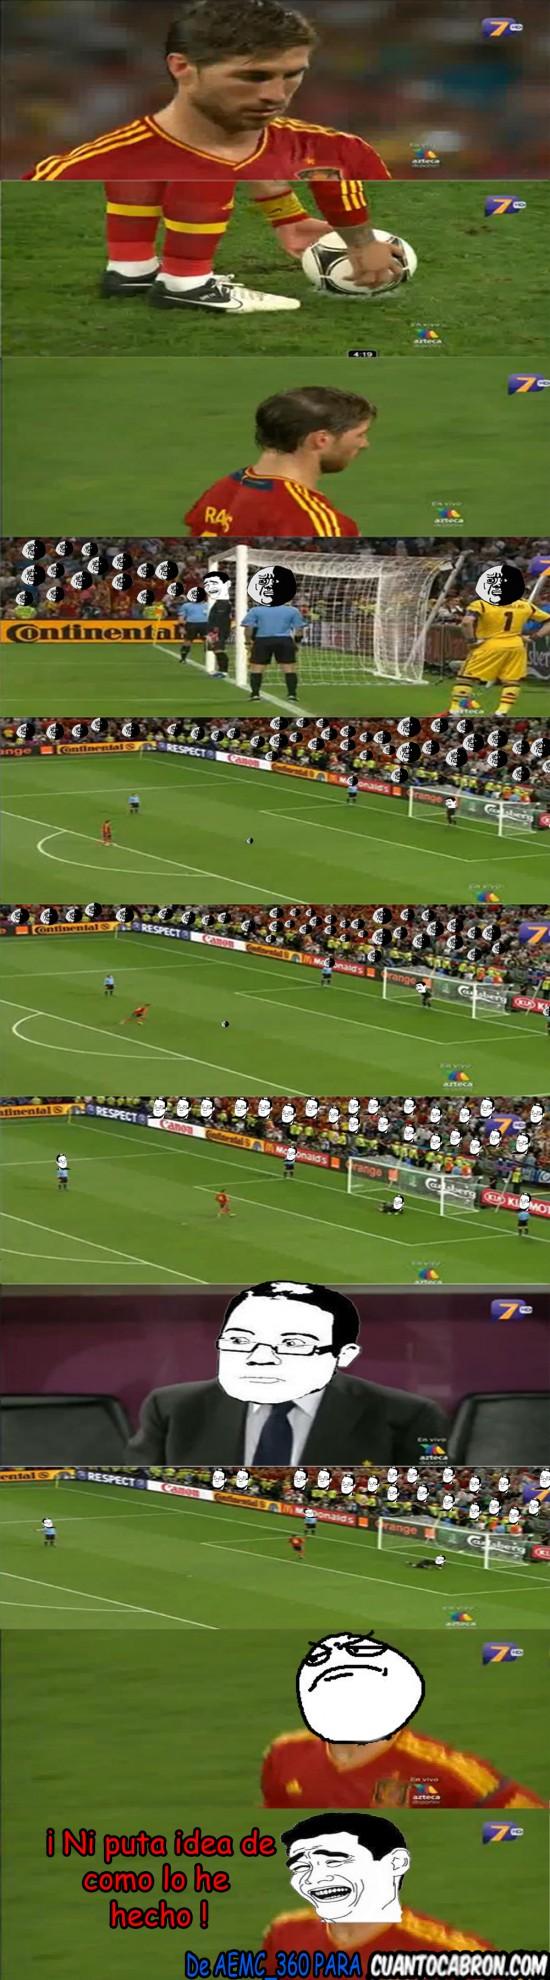 eurocopa,futbol,penalty,sergio ramos